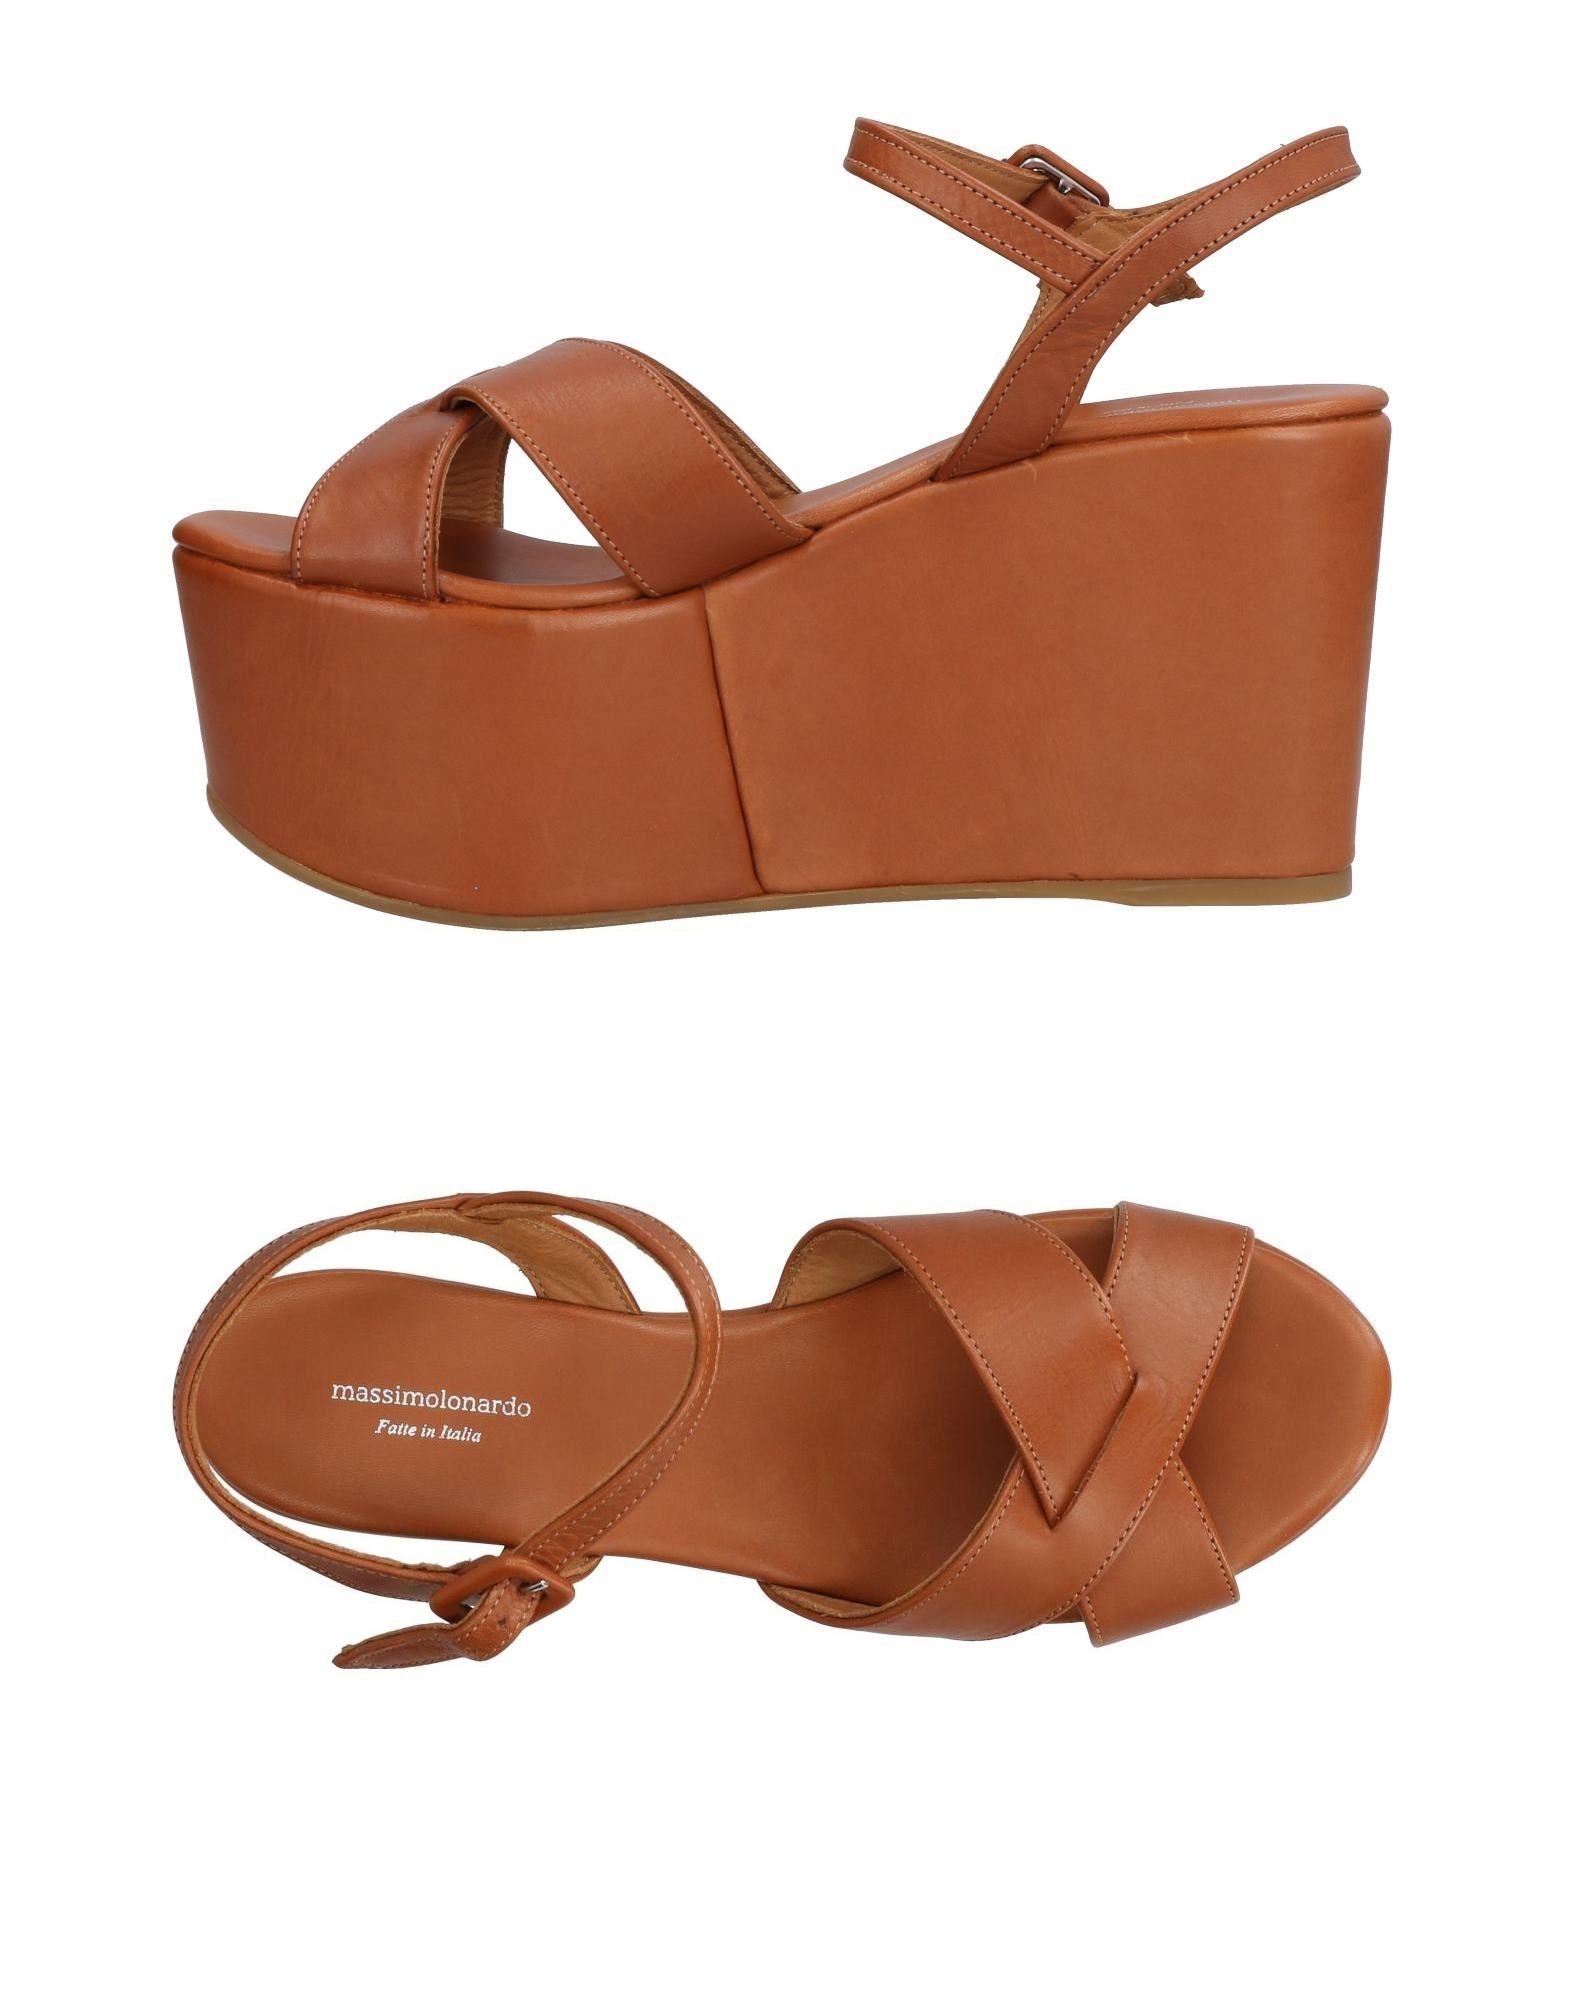 MASSIMO LONARDO Sandals in Tan